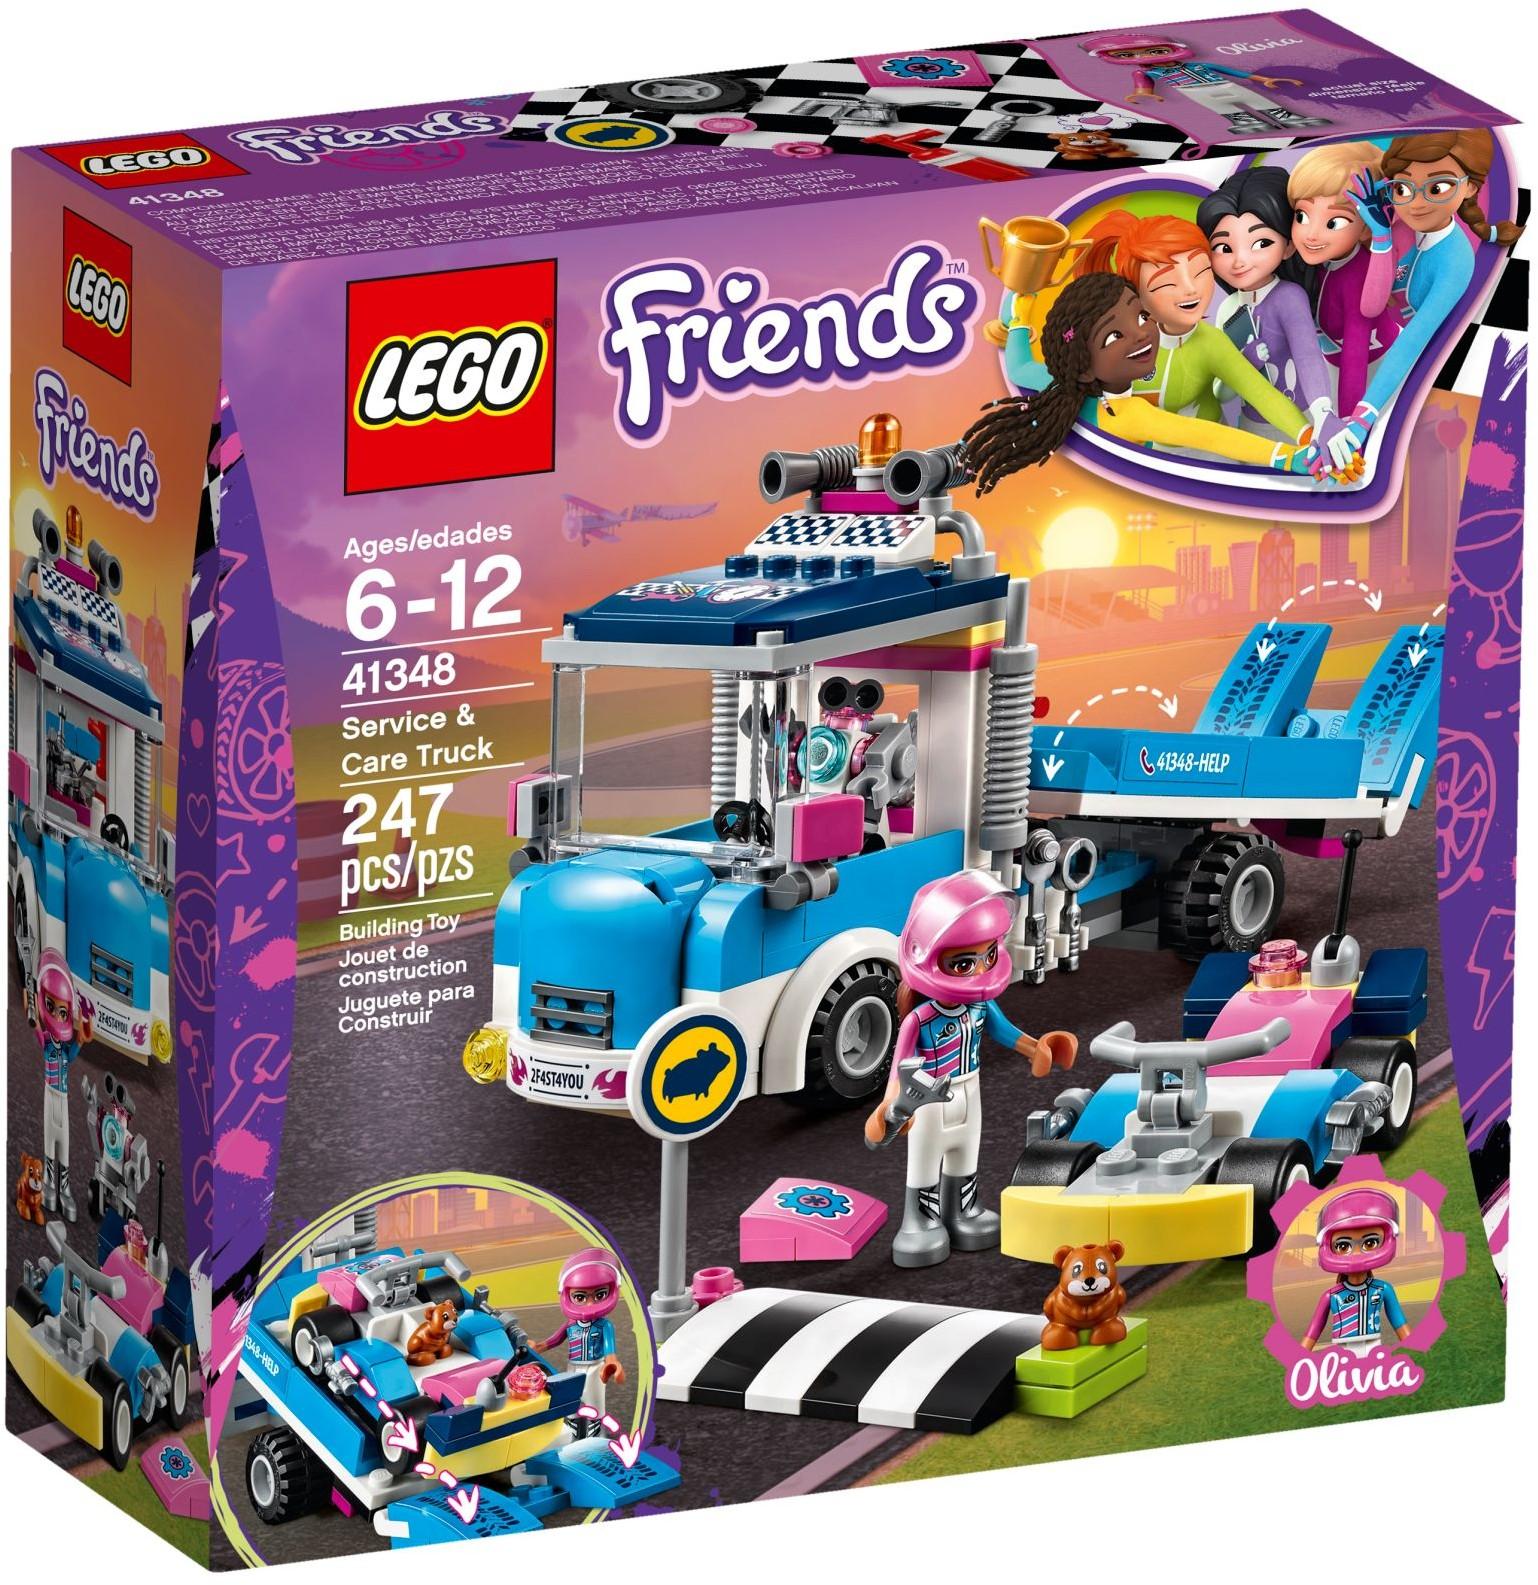 Service & Care Truck (41348) | LEGO Friends Wiki | Fandom